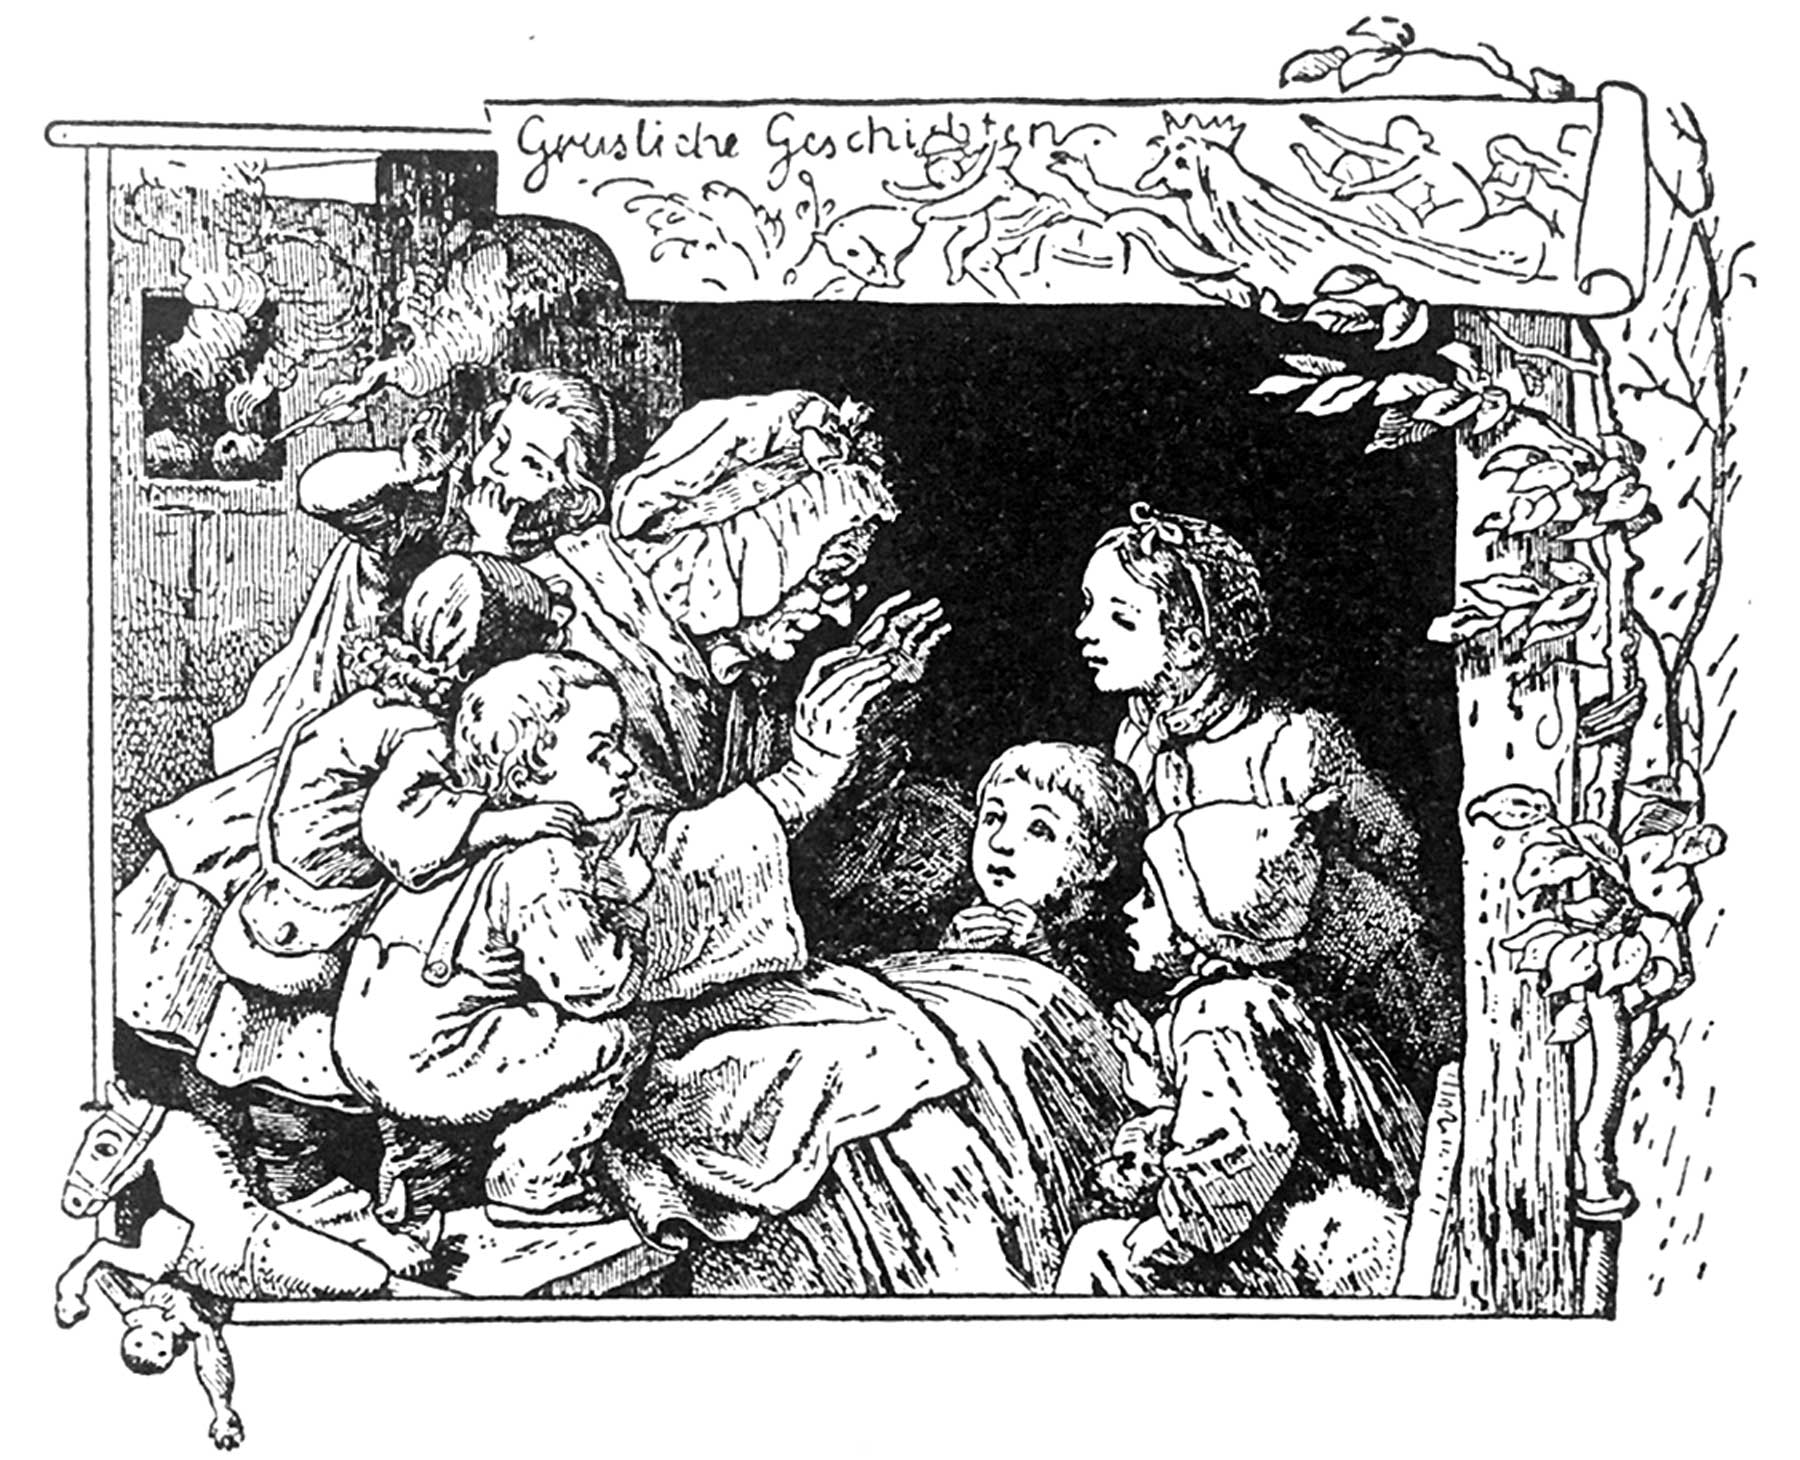 Großmutter Grimm am Ofen erzählt der sechsköpfgen Kinderschar gruselige Märchen